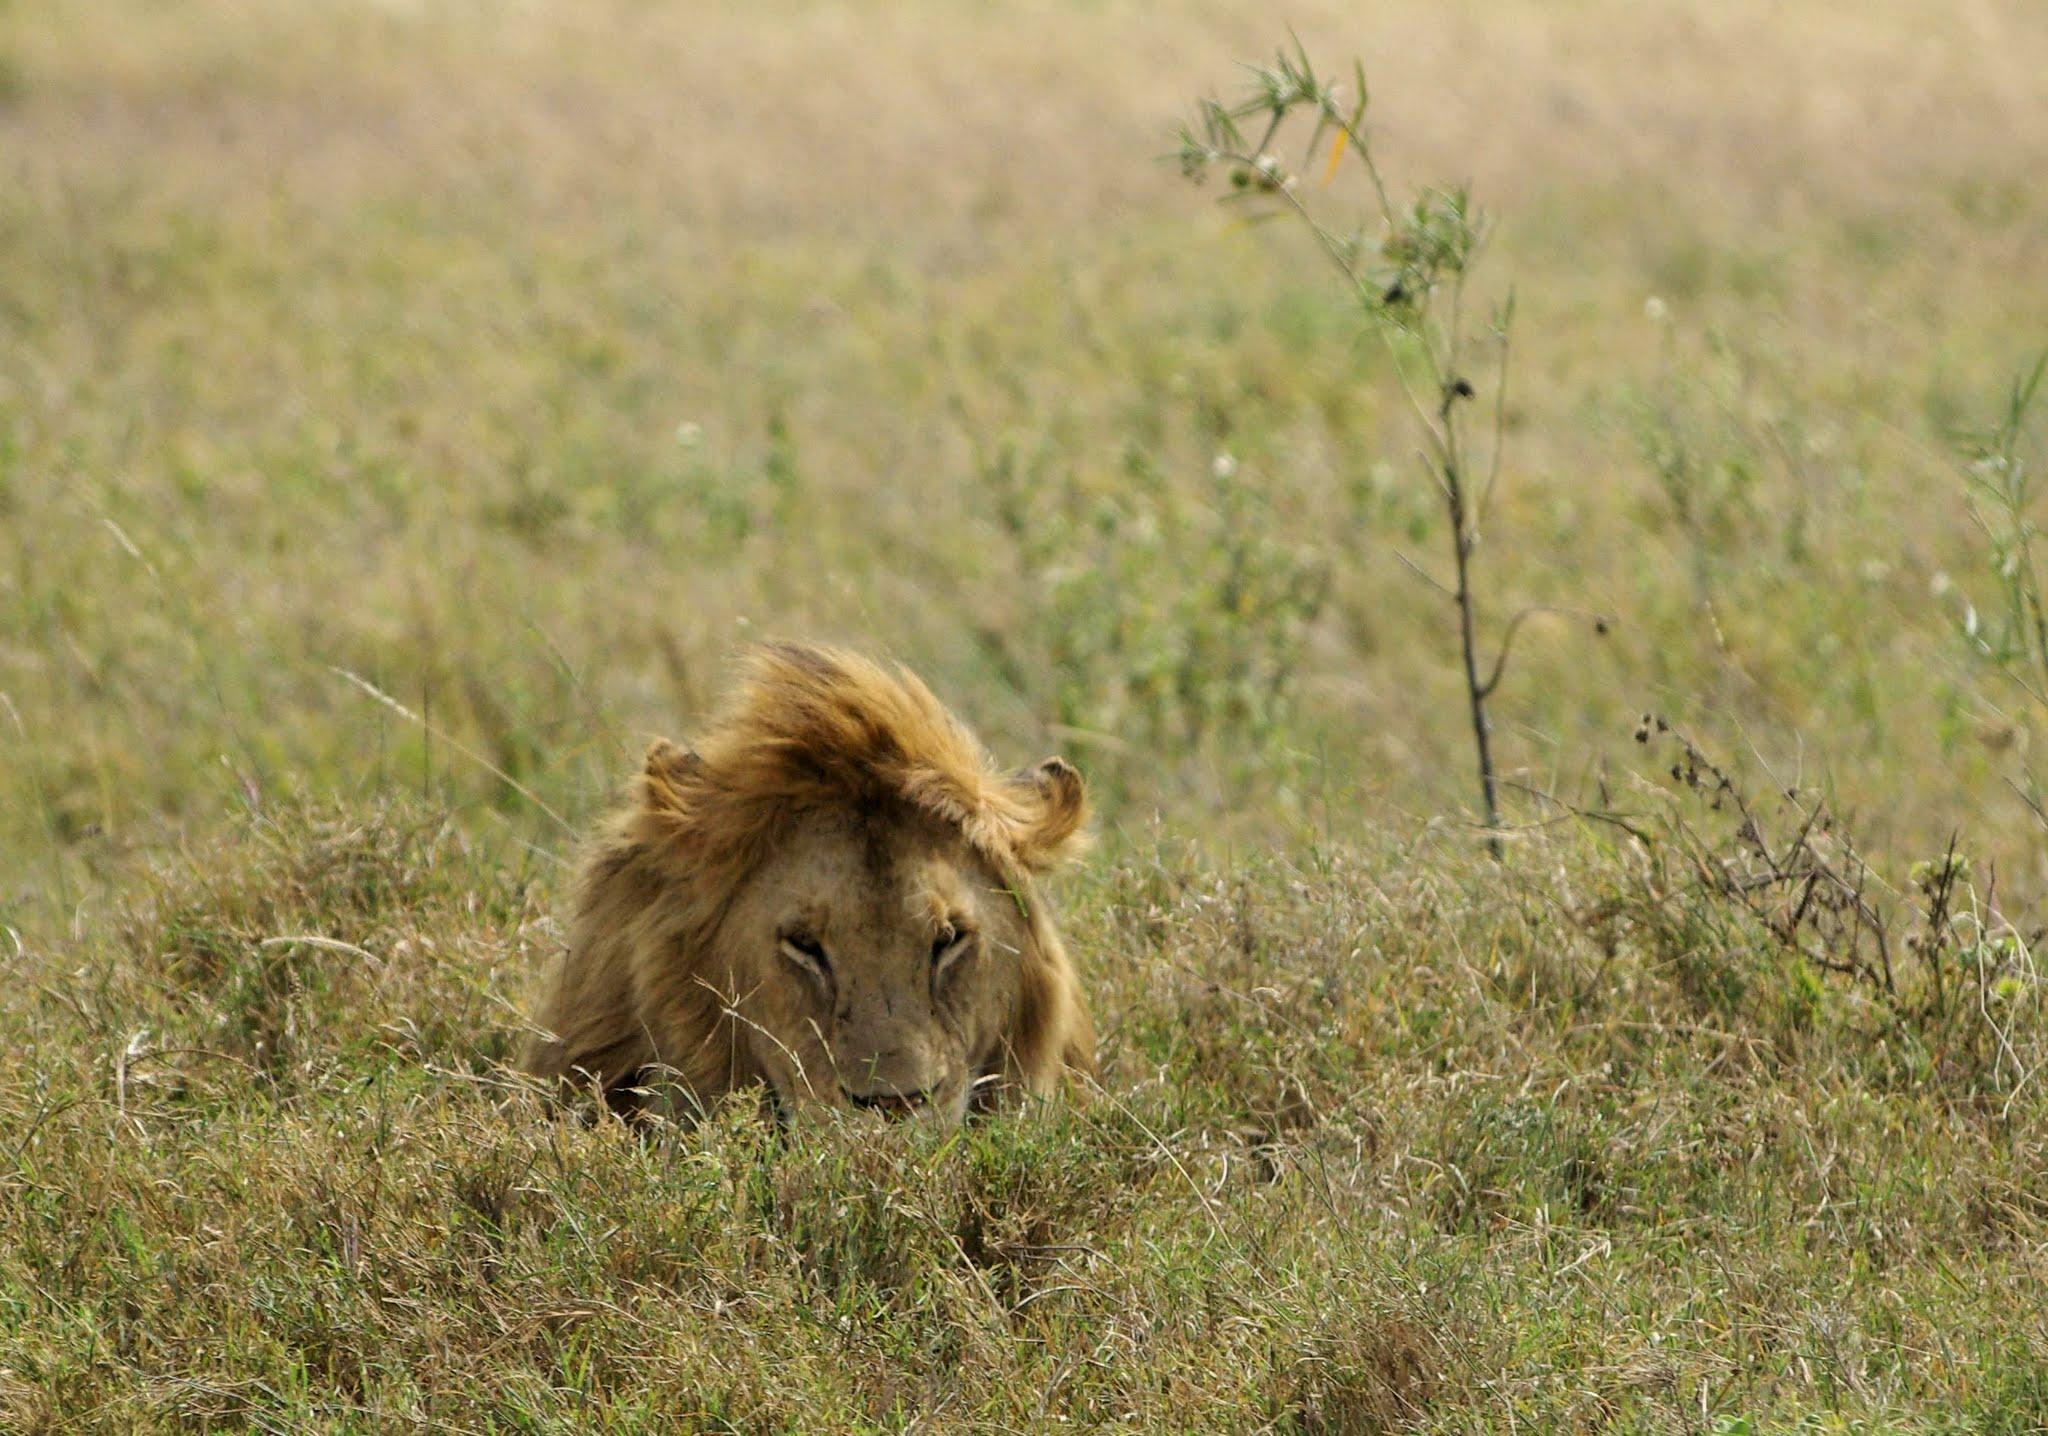 lion2-serengeti-06-08_dxo